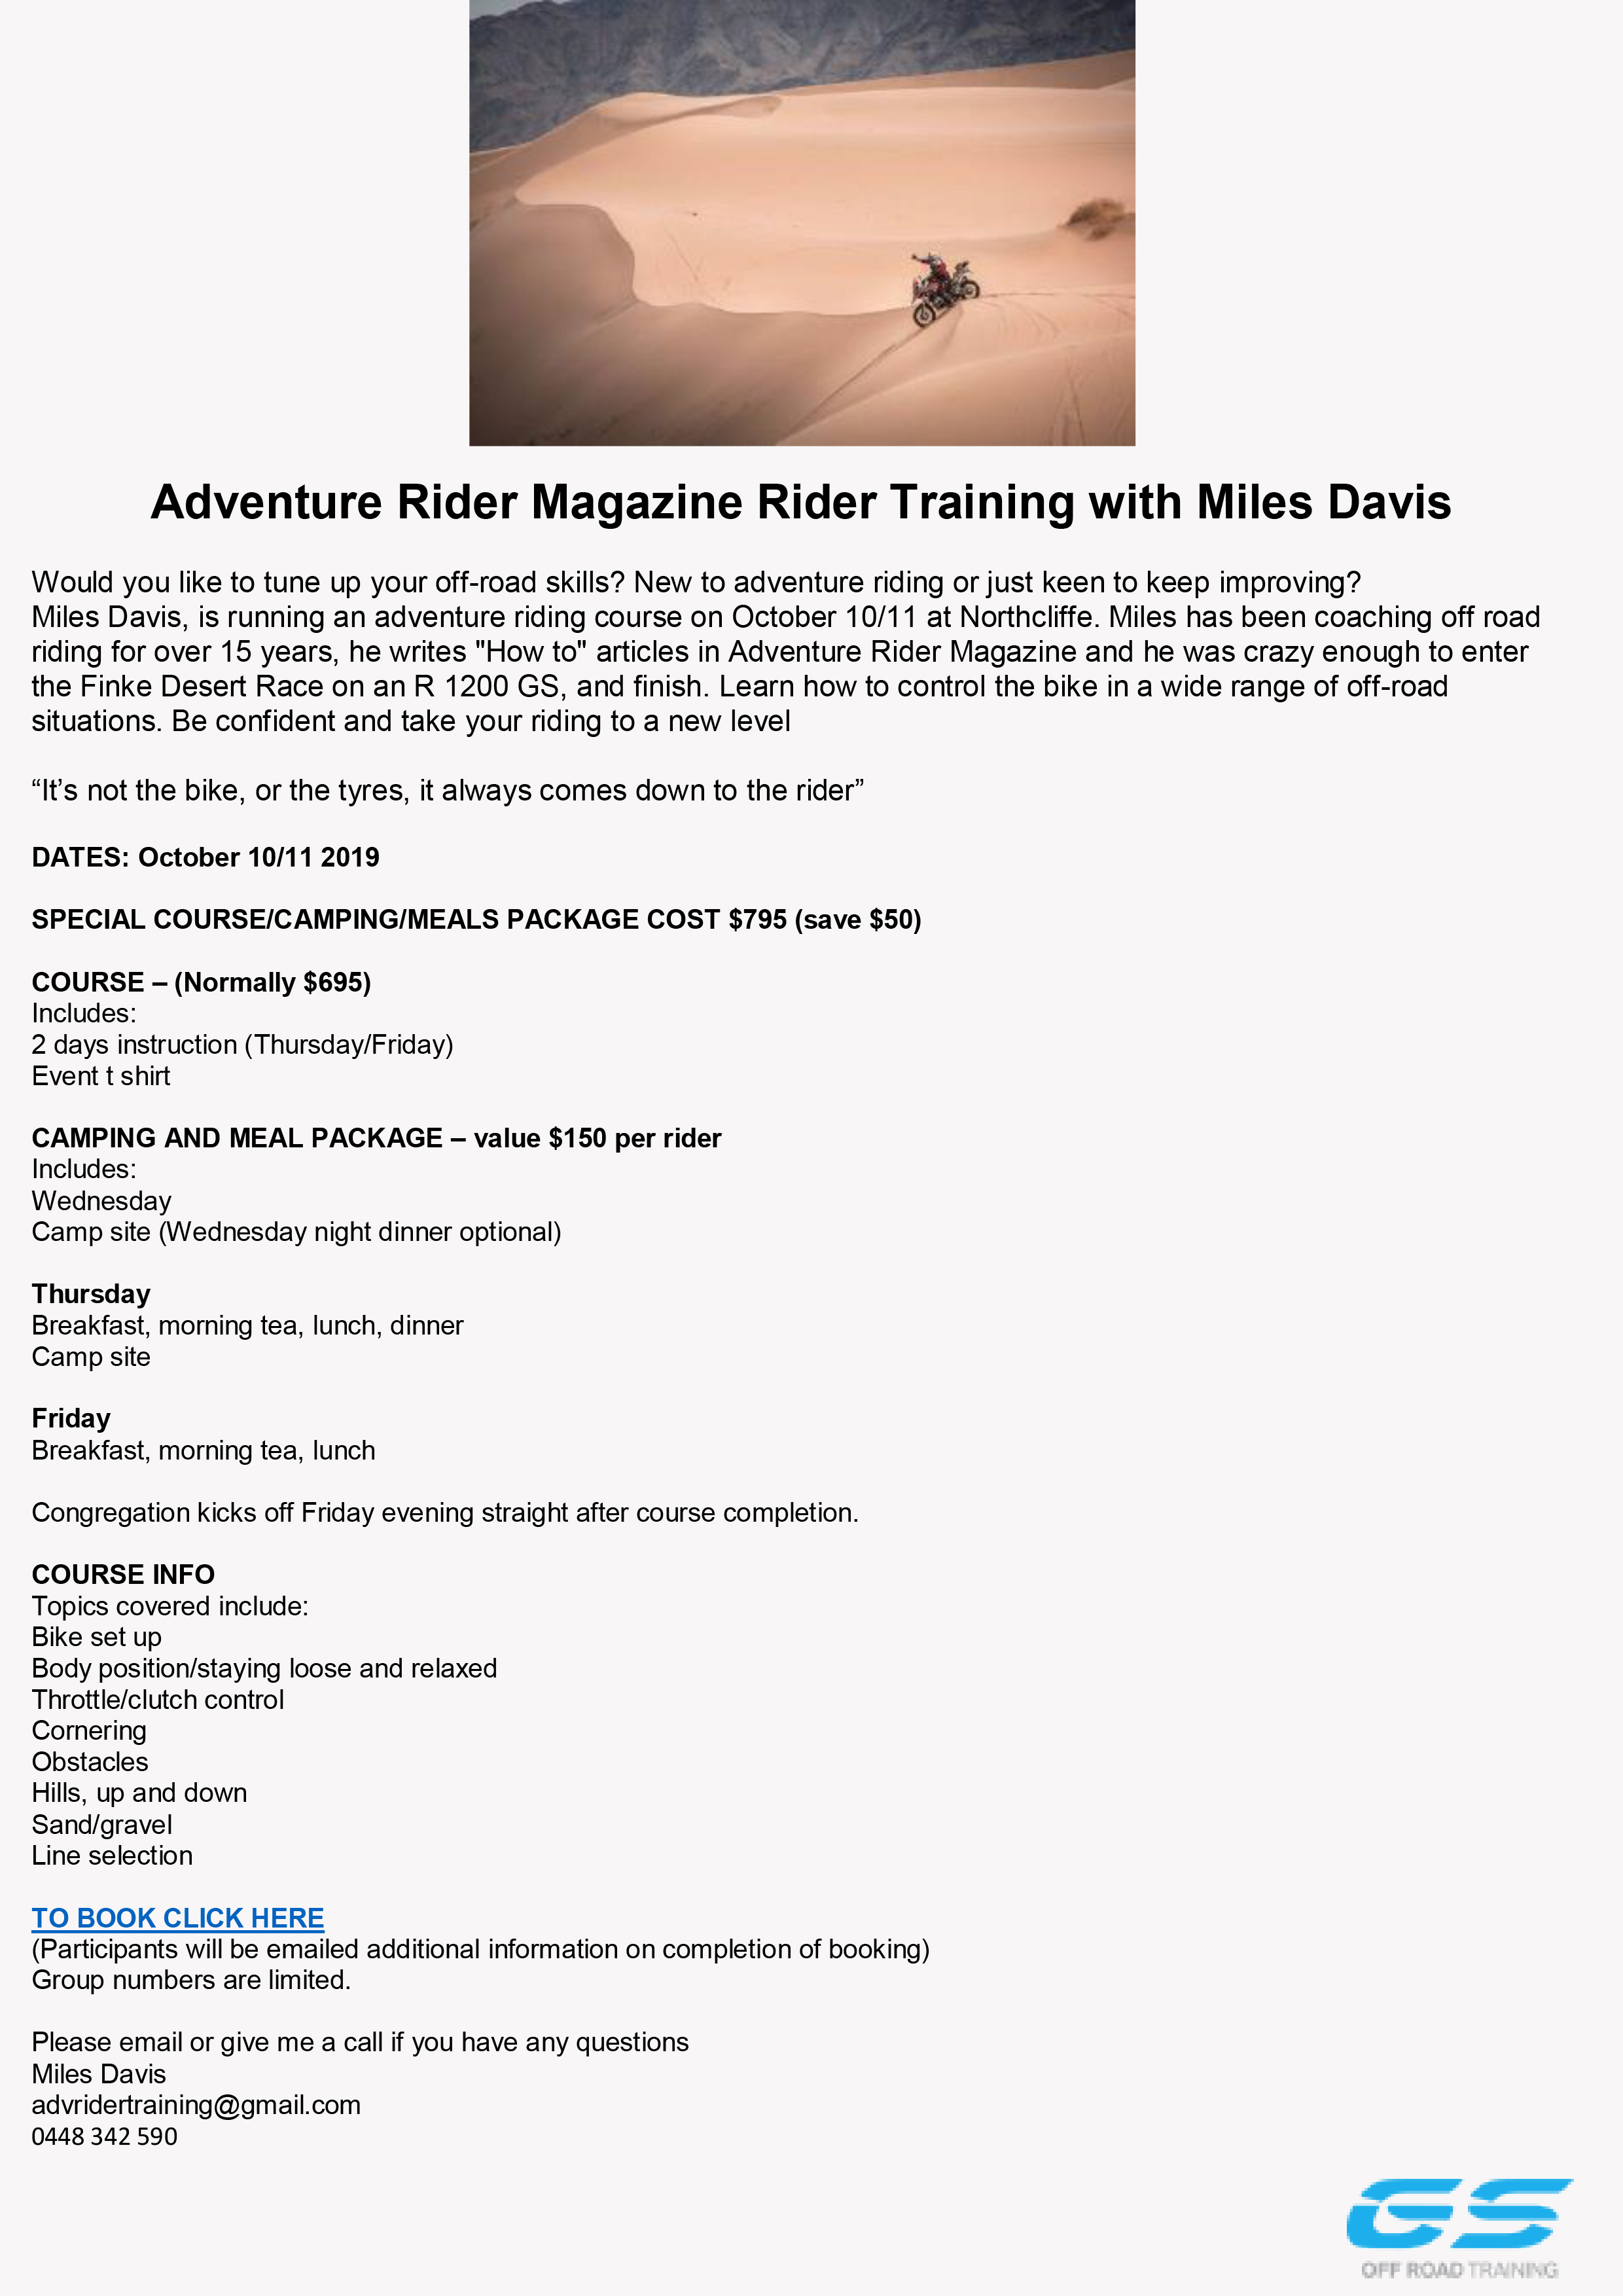 Miles Davis Rider Training